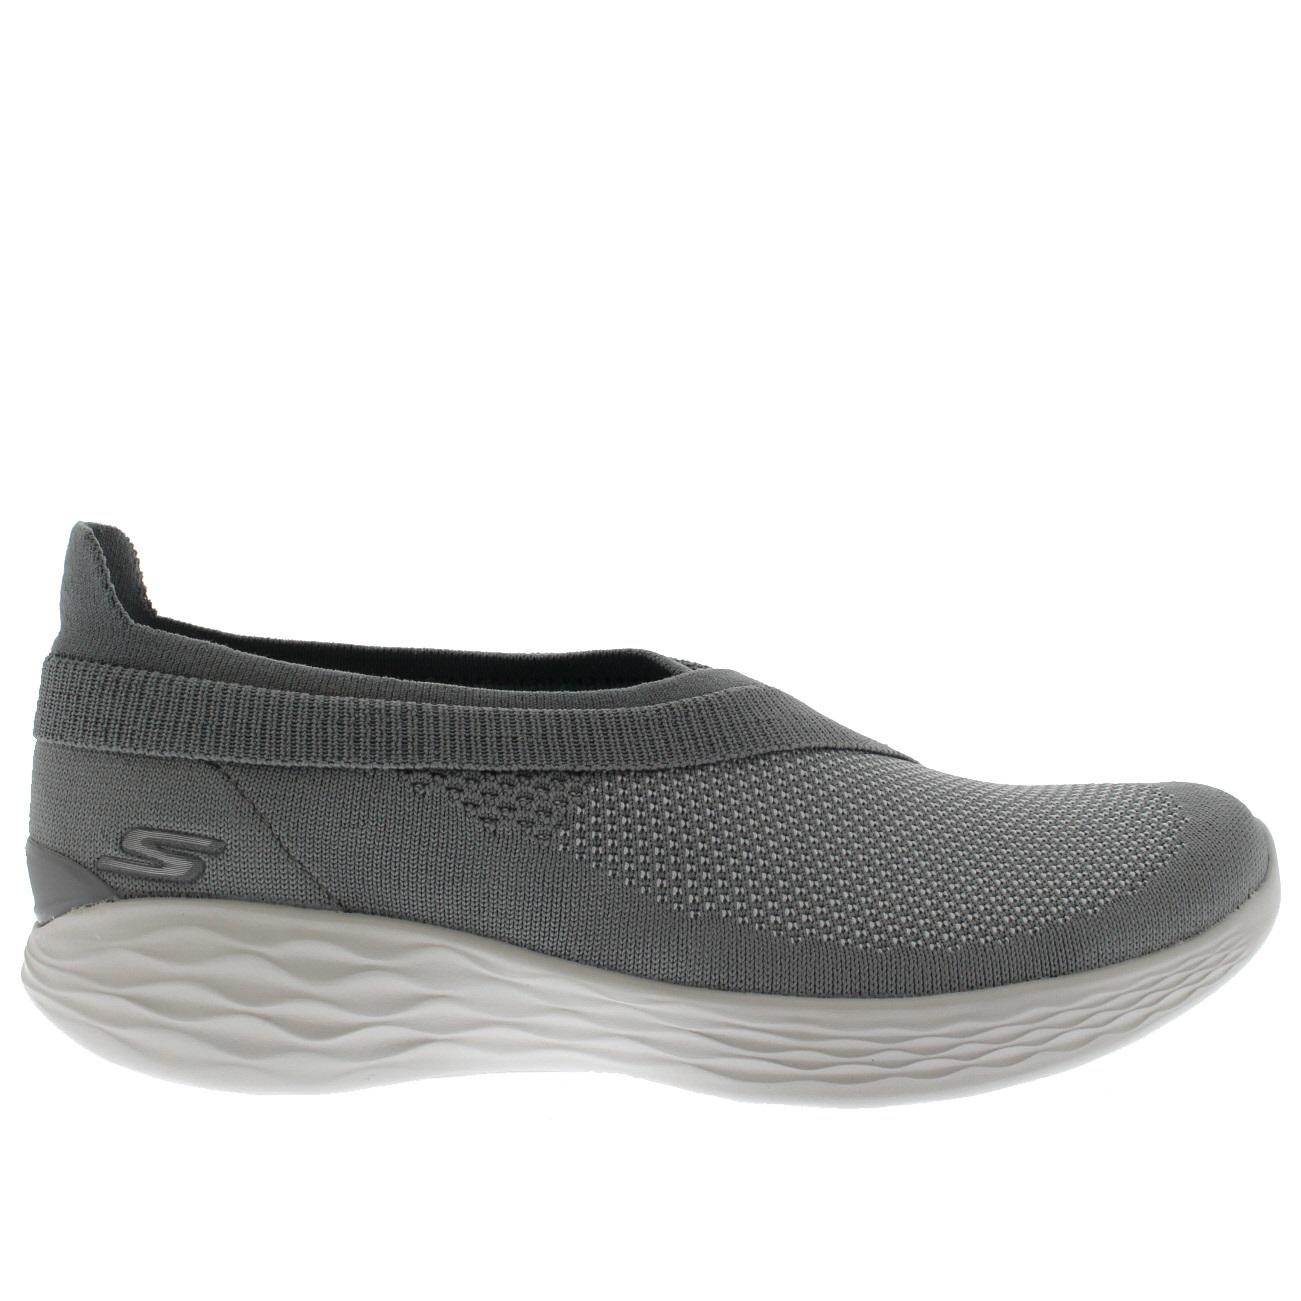 Damenschuhe Skechers You Luxe Flexible Memory Foam Lightweight Yoga Flexible Luxe Sneakers US 6-11 ad633b